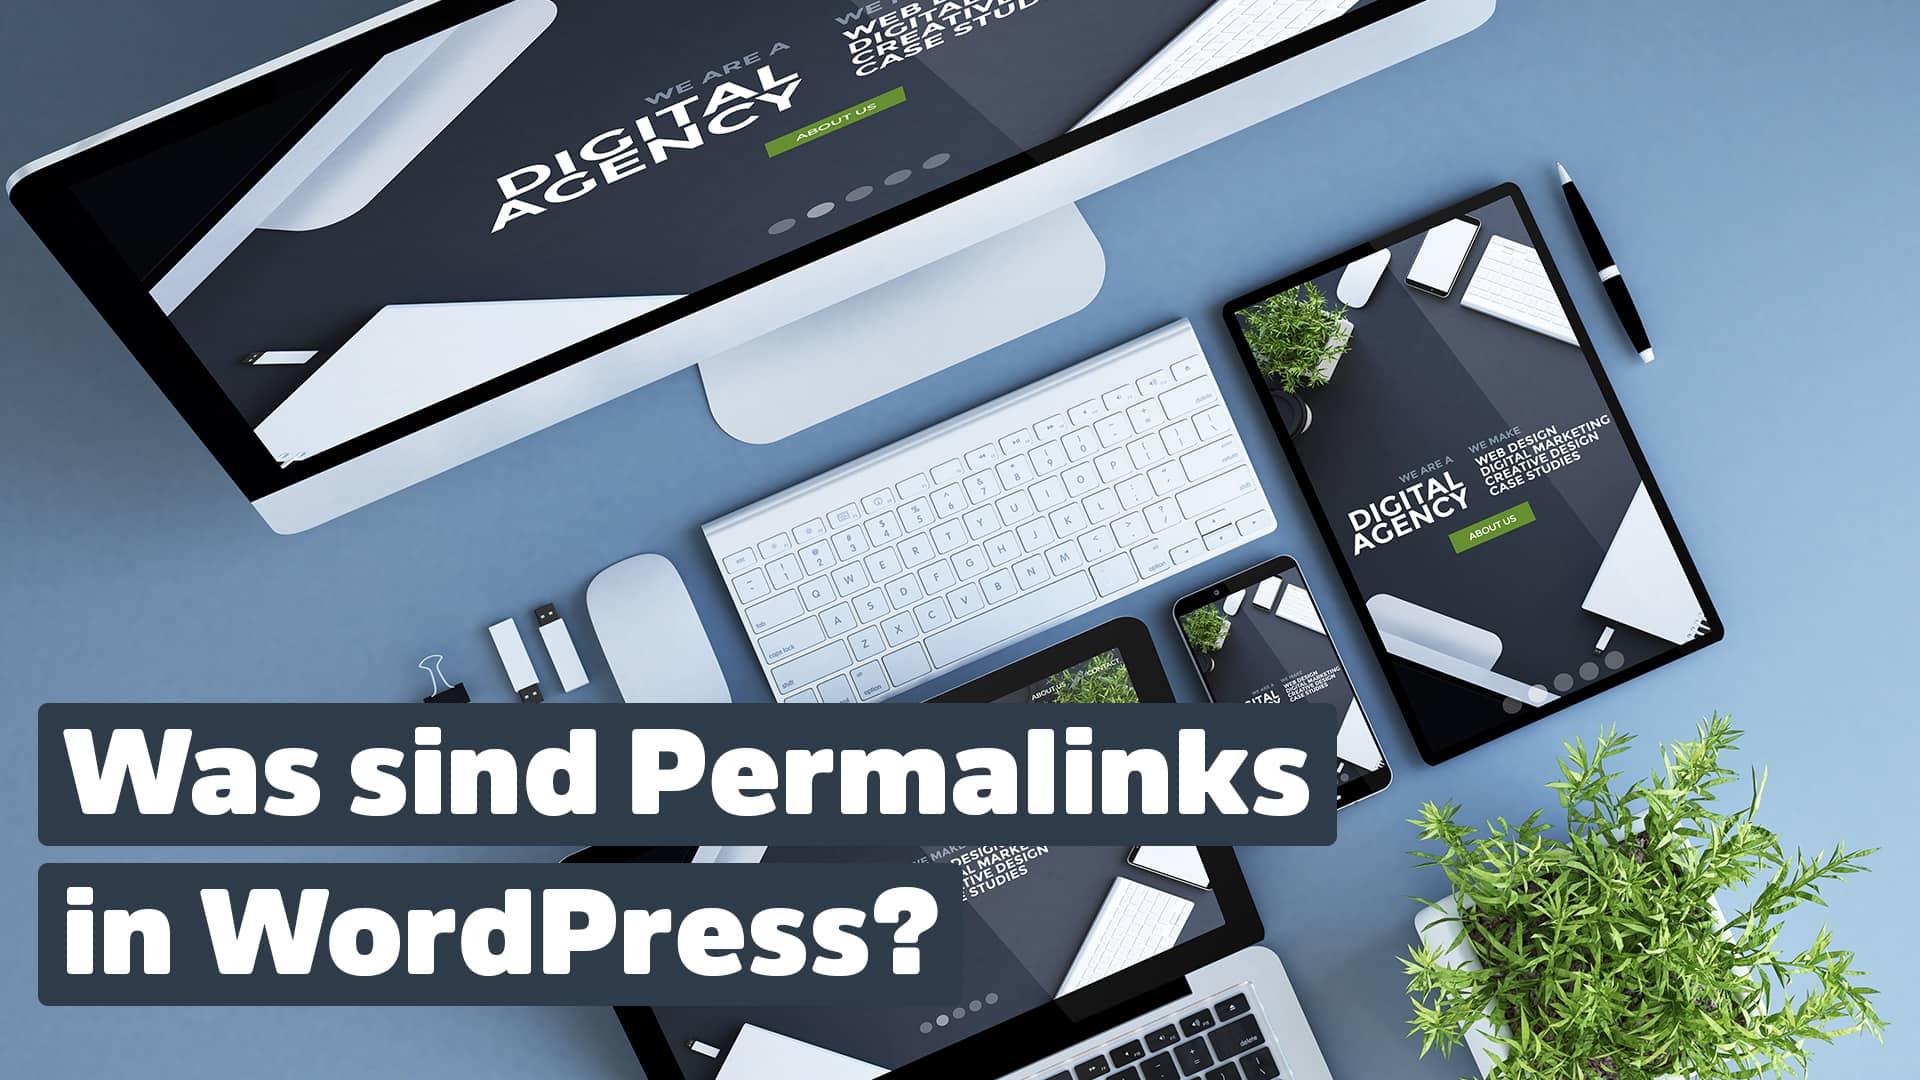 Was sind Permalink in WordPress?